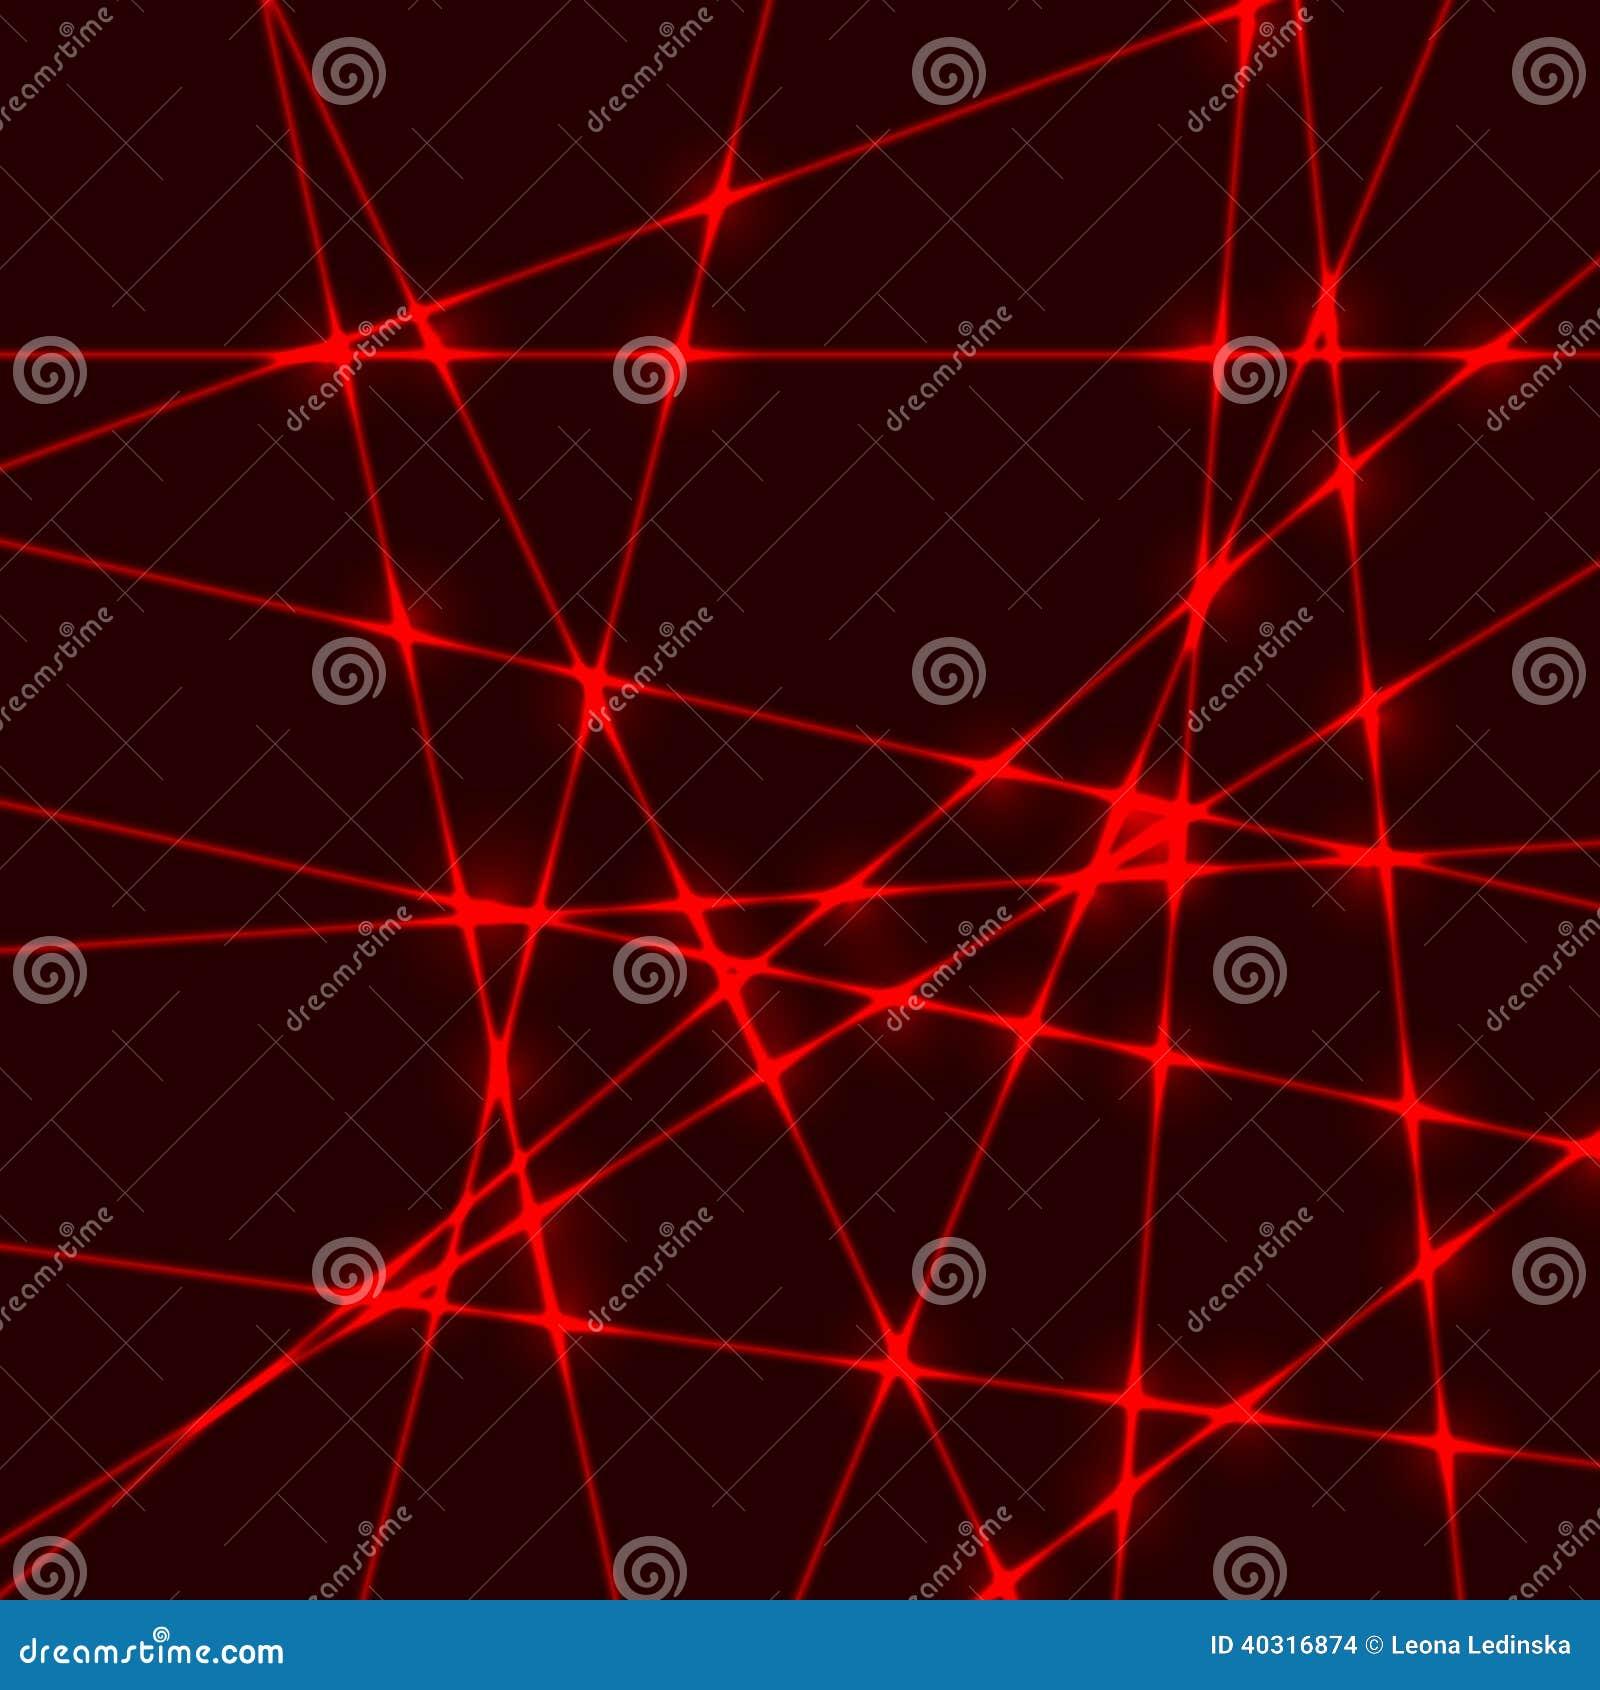 Red Laser Light Beam Stock Vector Illustration Of Design